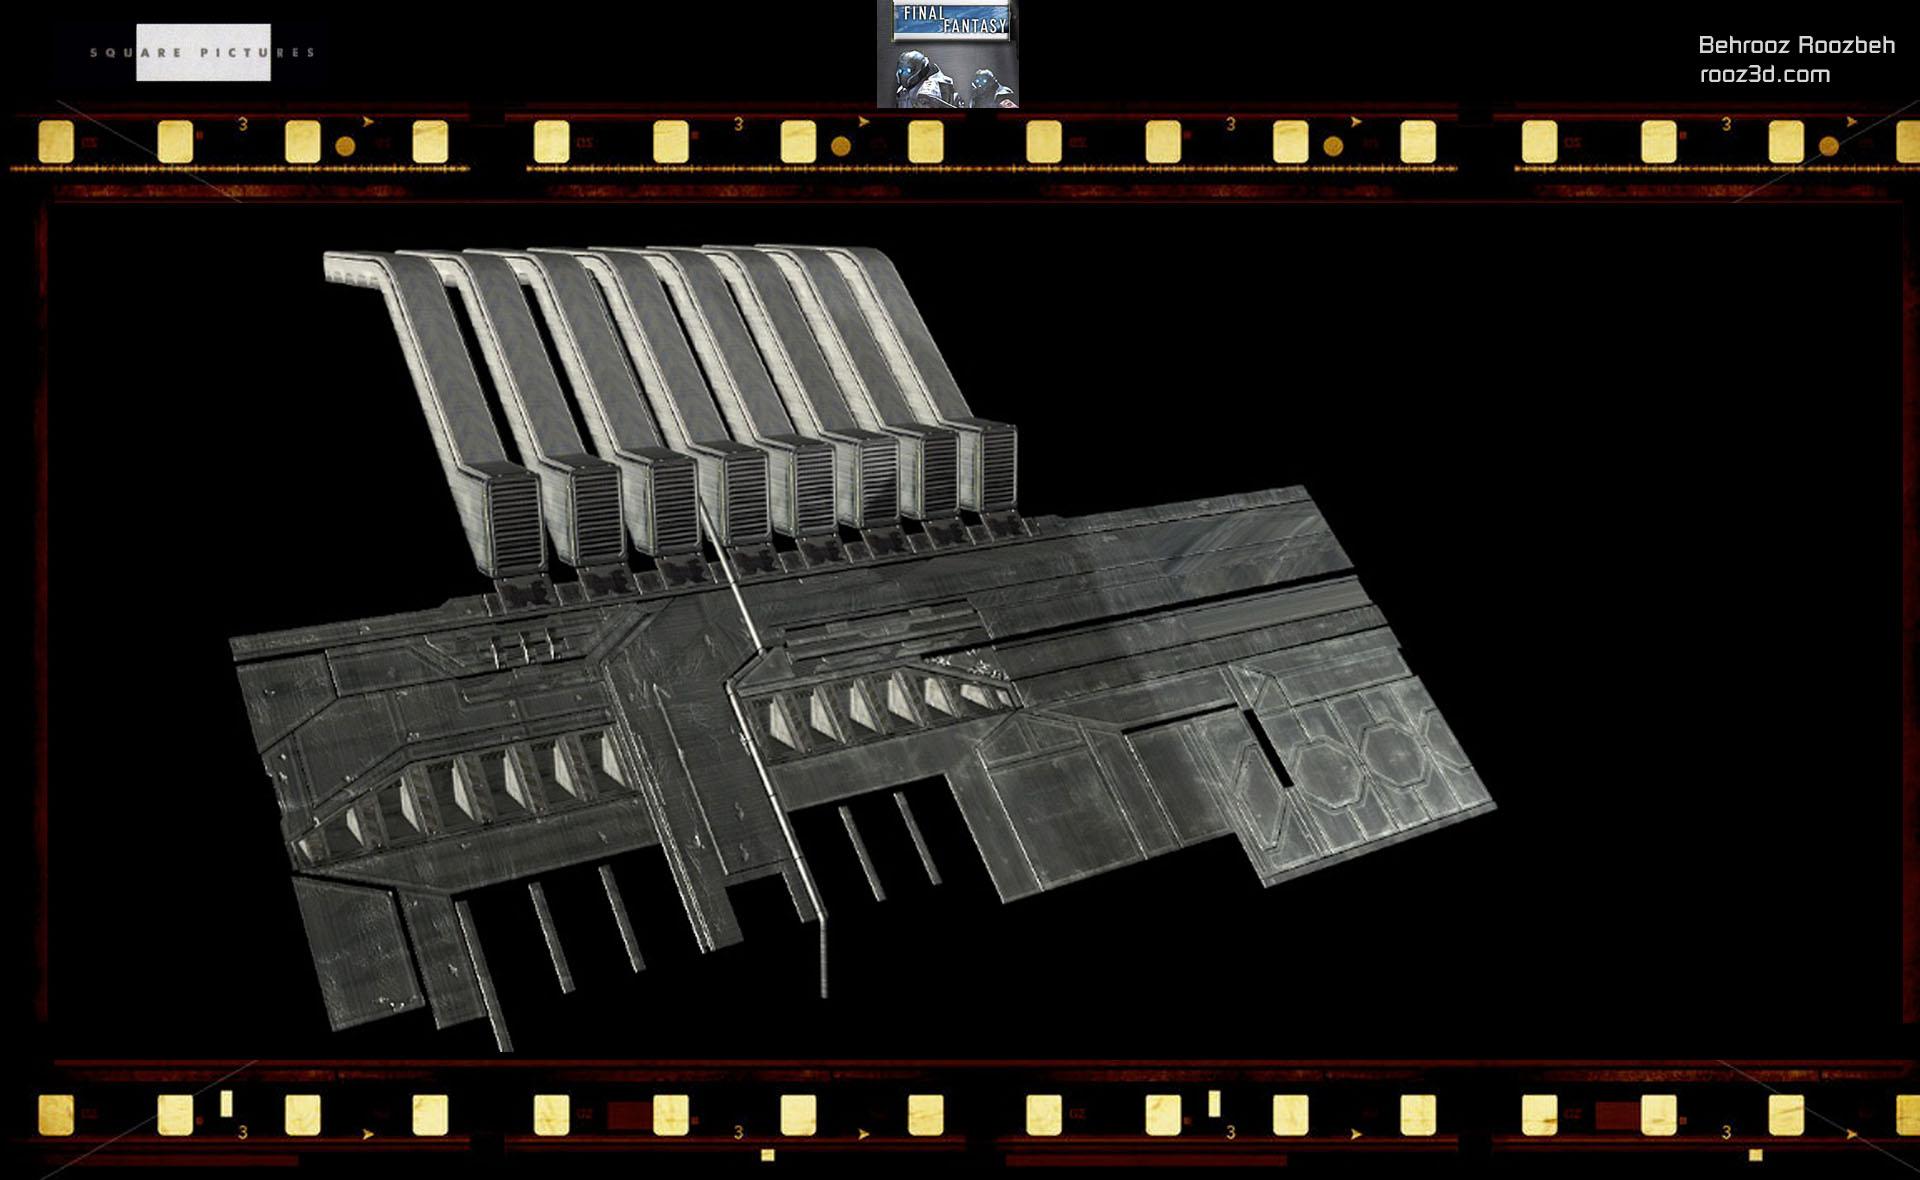 ffmovie_0010_Roof.jpg